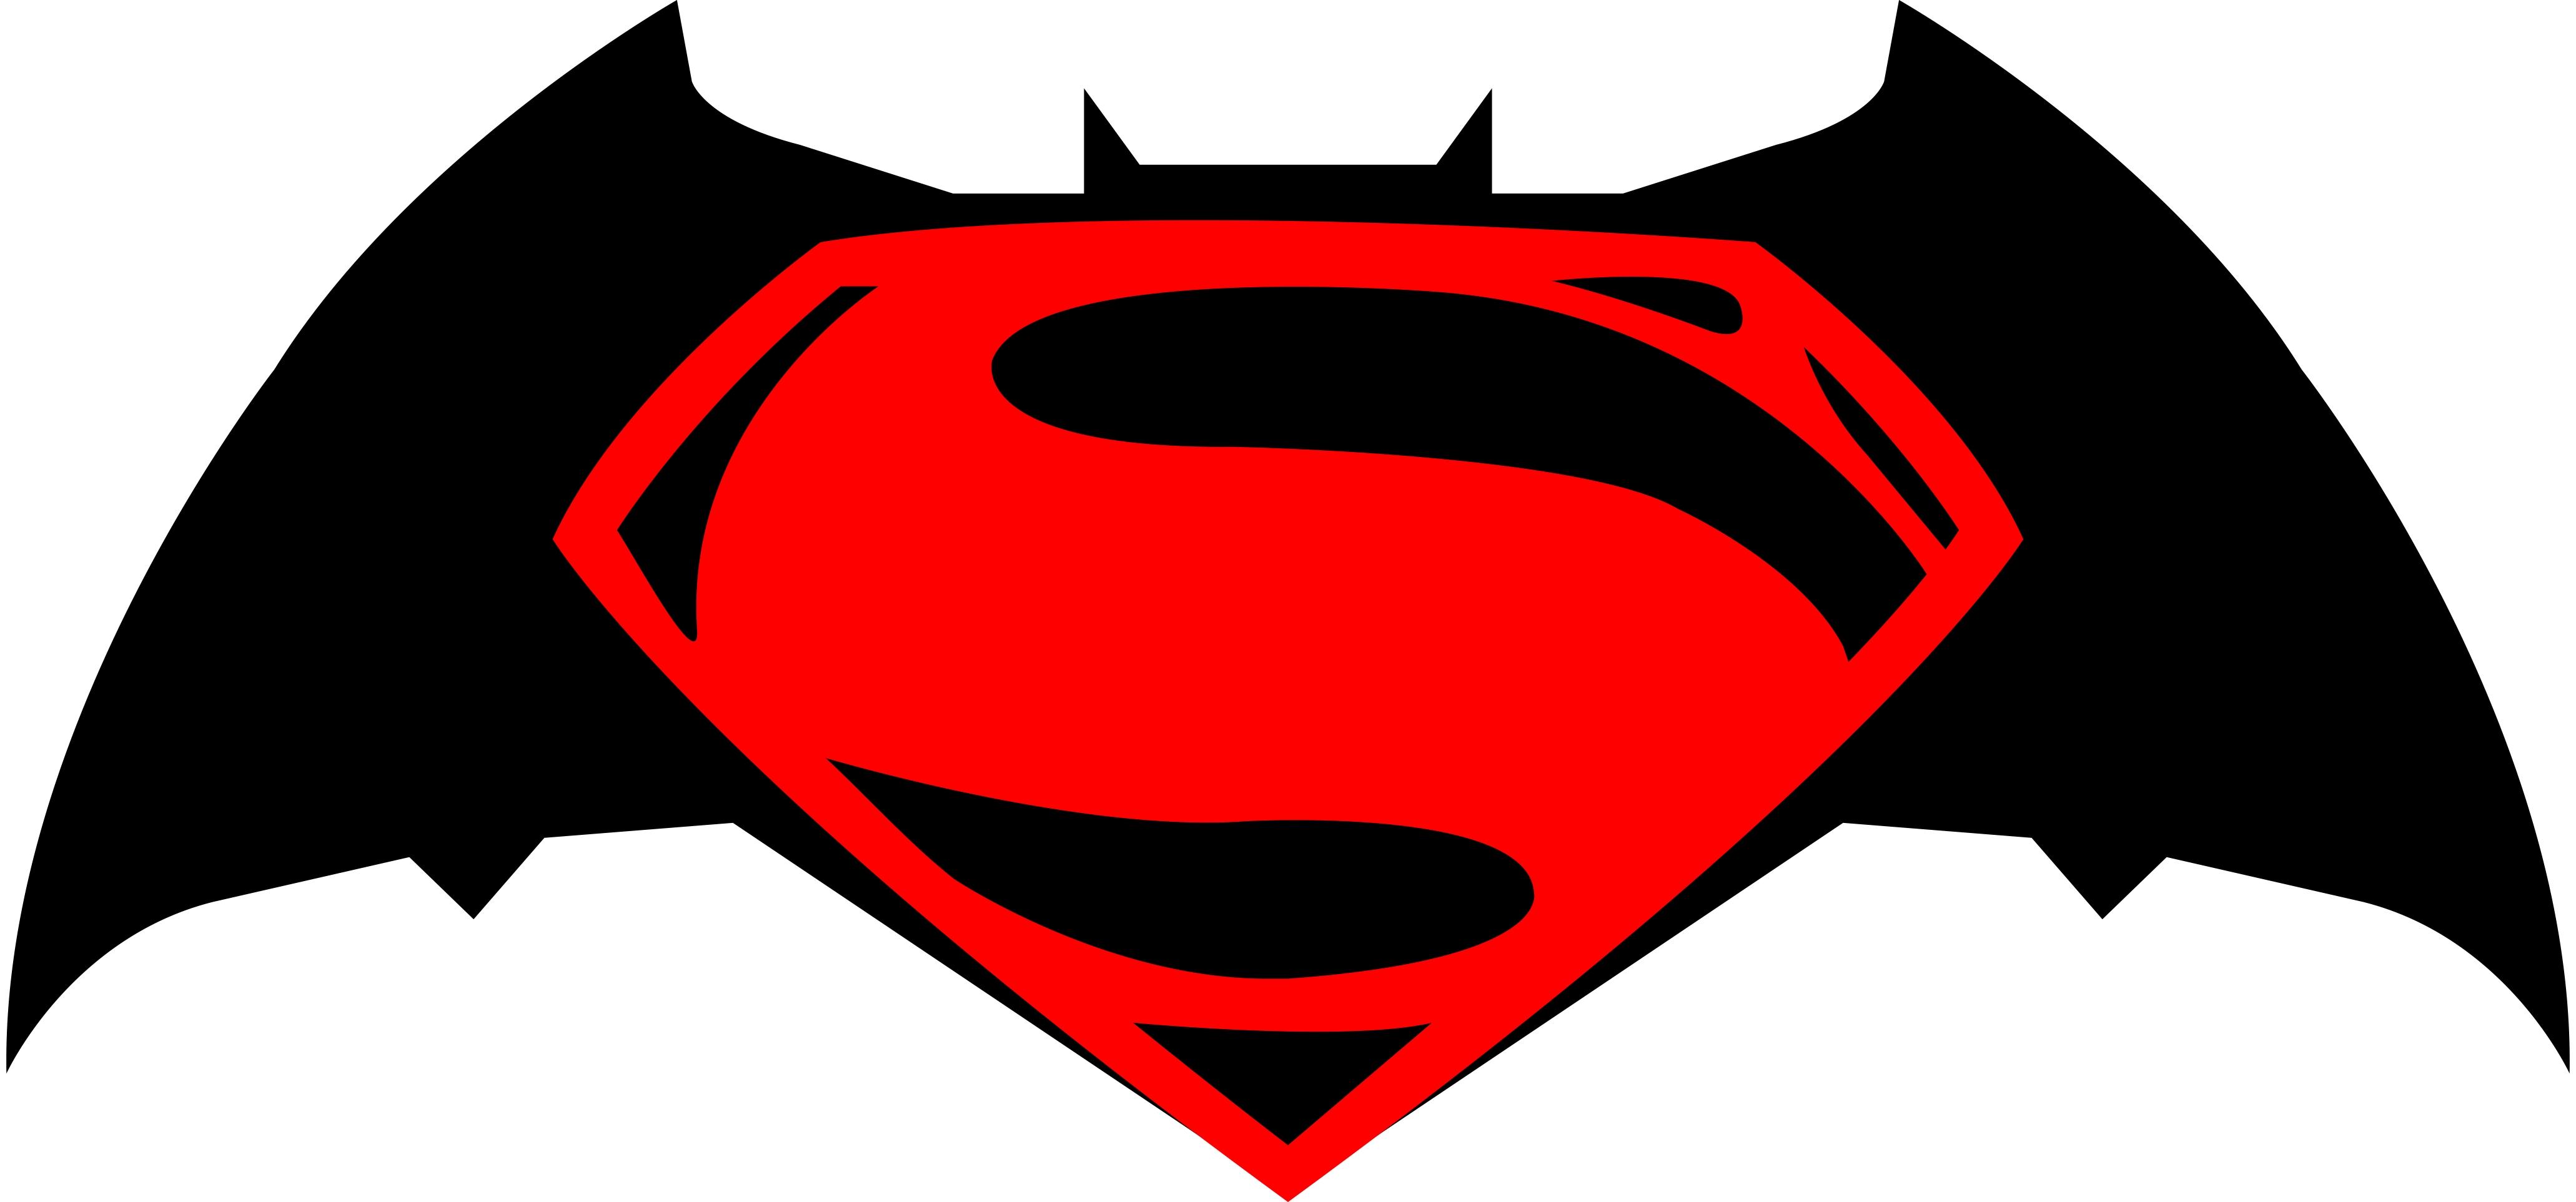 batman symbol clipart at getdrawings com free for personal use rh getdrawings com superman vector logo png superman vector logo png